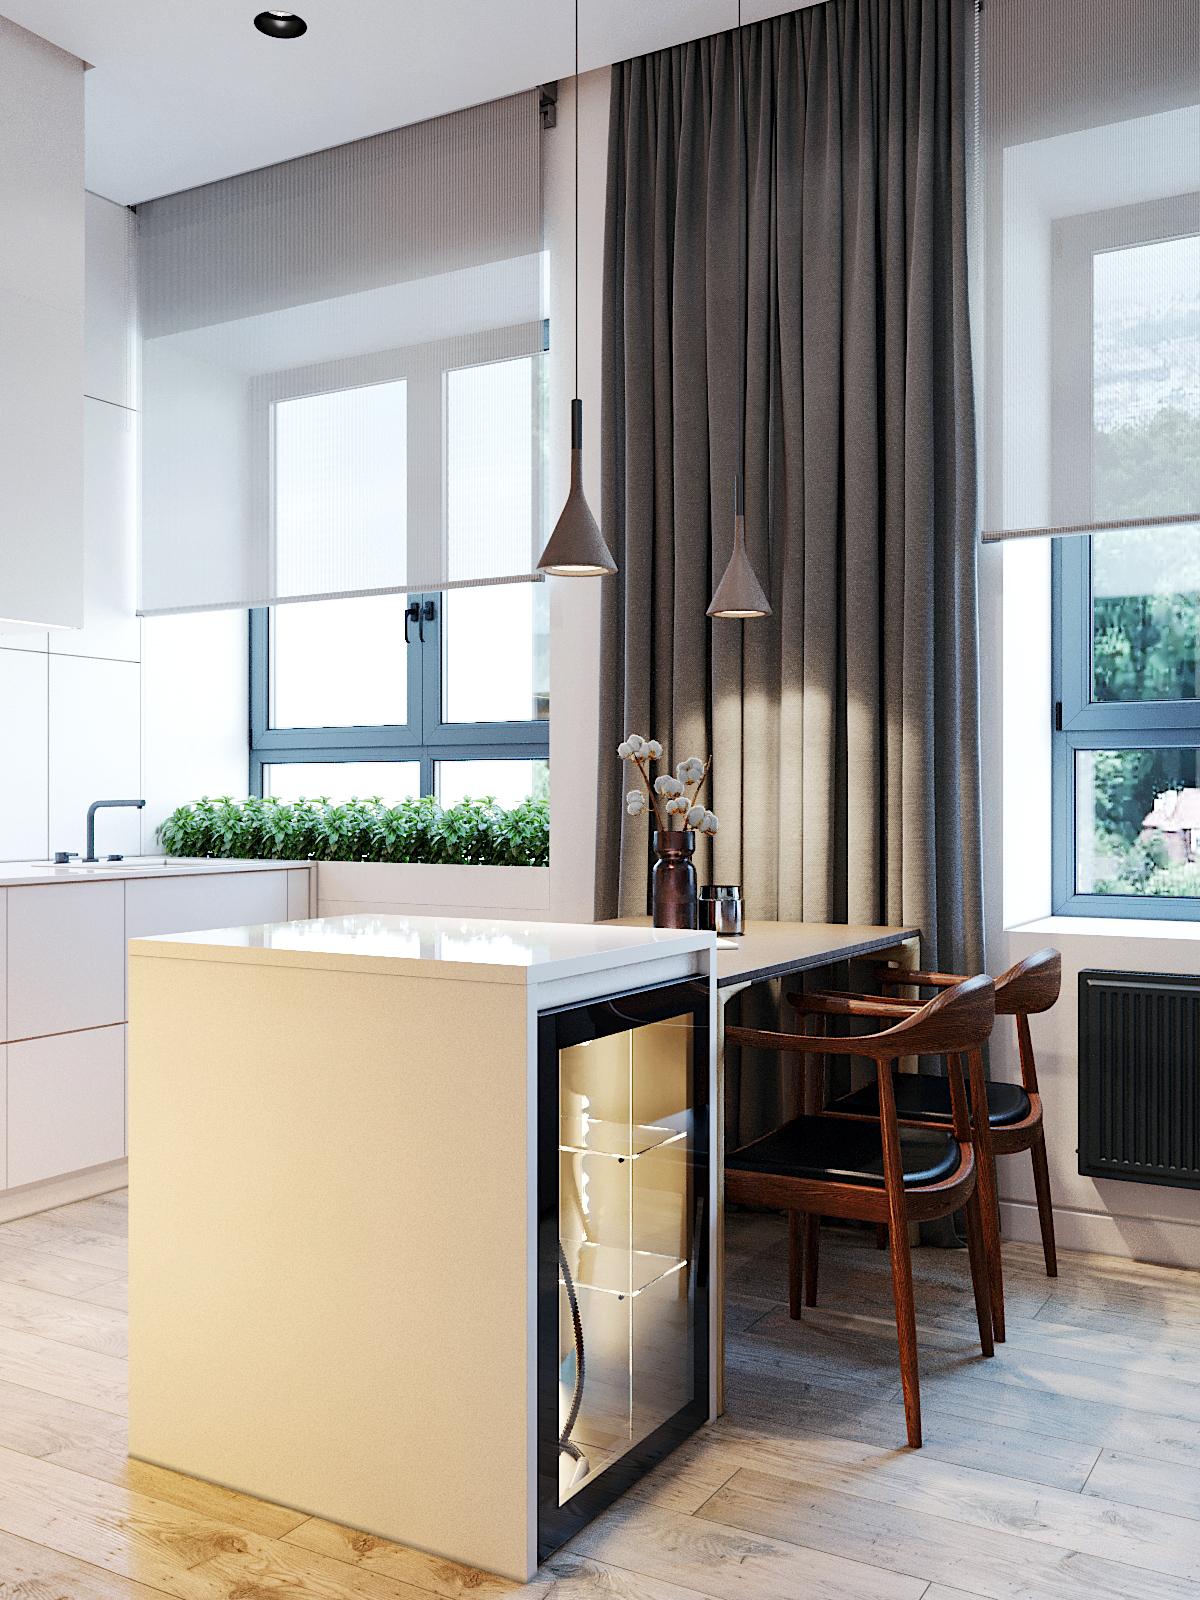 https://avantum-remont.ru/wp-content/uploads/2015/05/Livingroom-Kitchen_Interactive-LightMix_View08.jpg